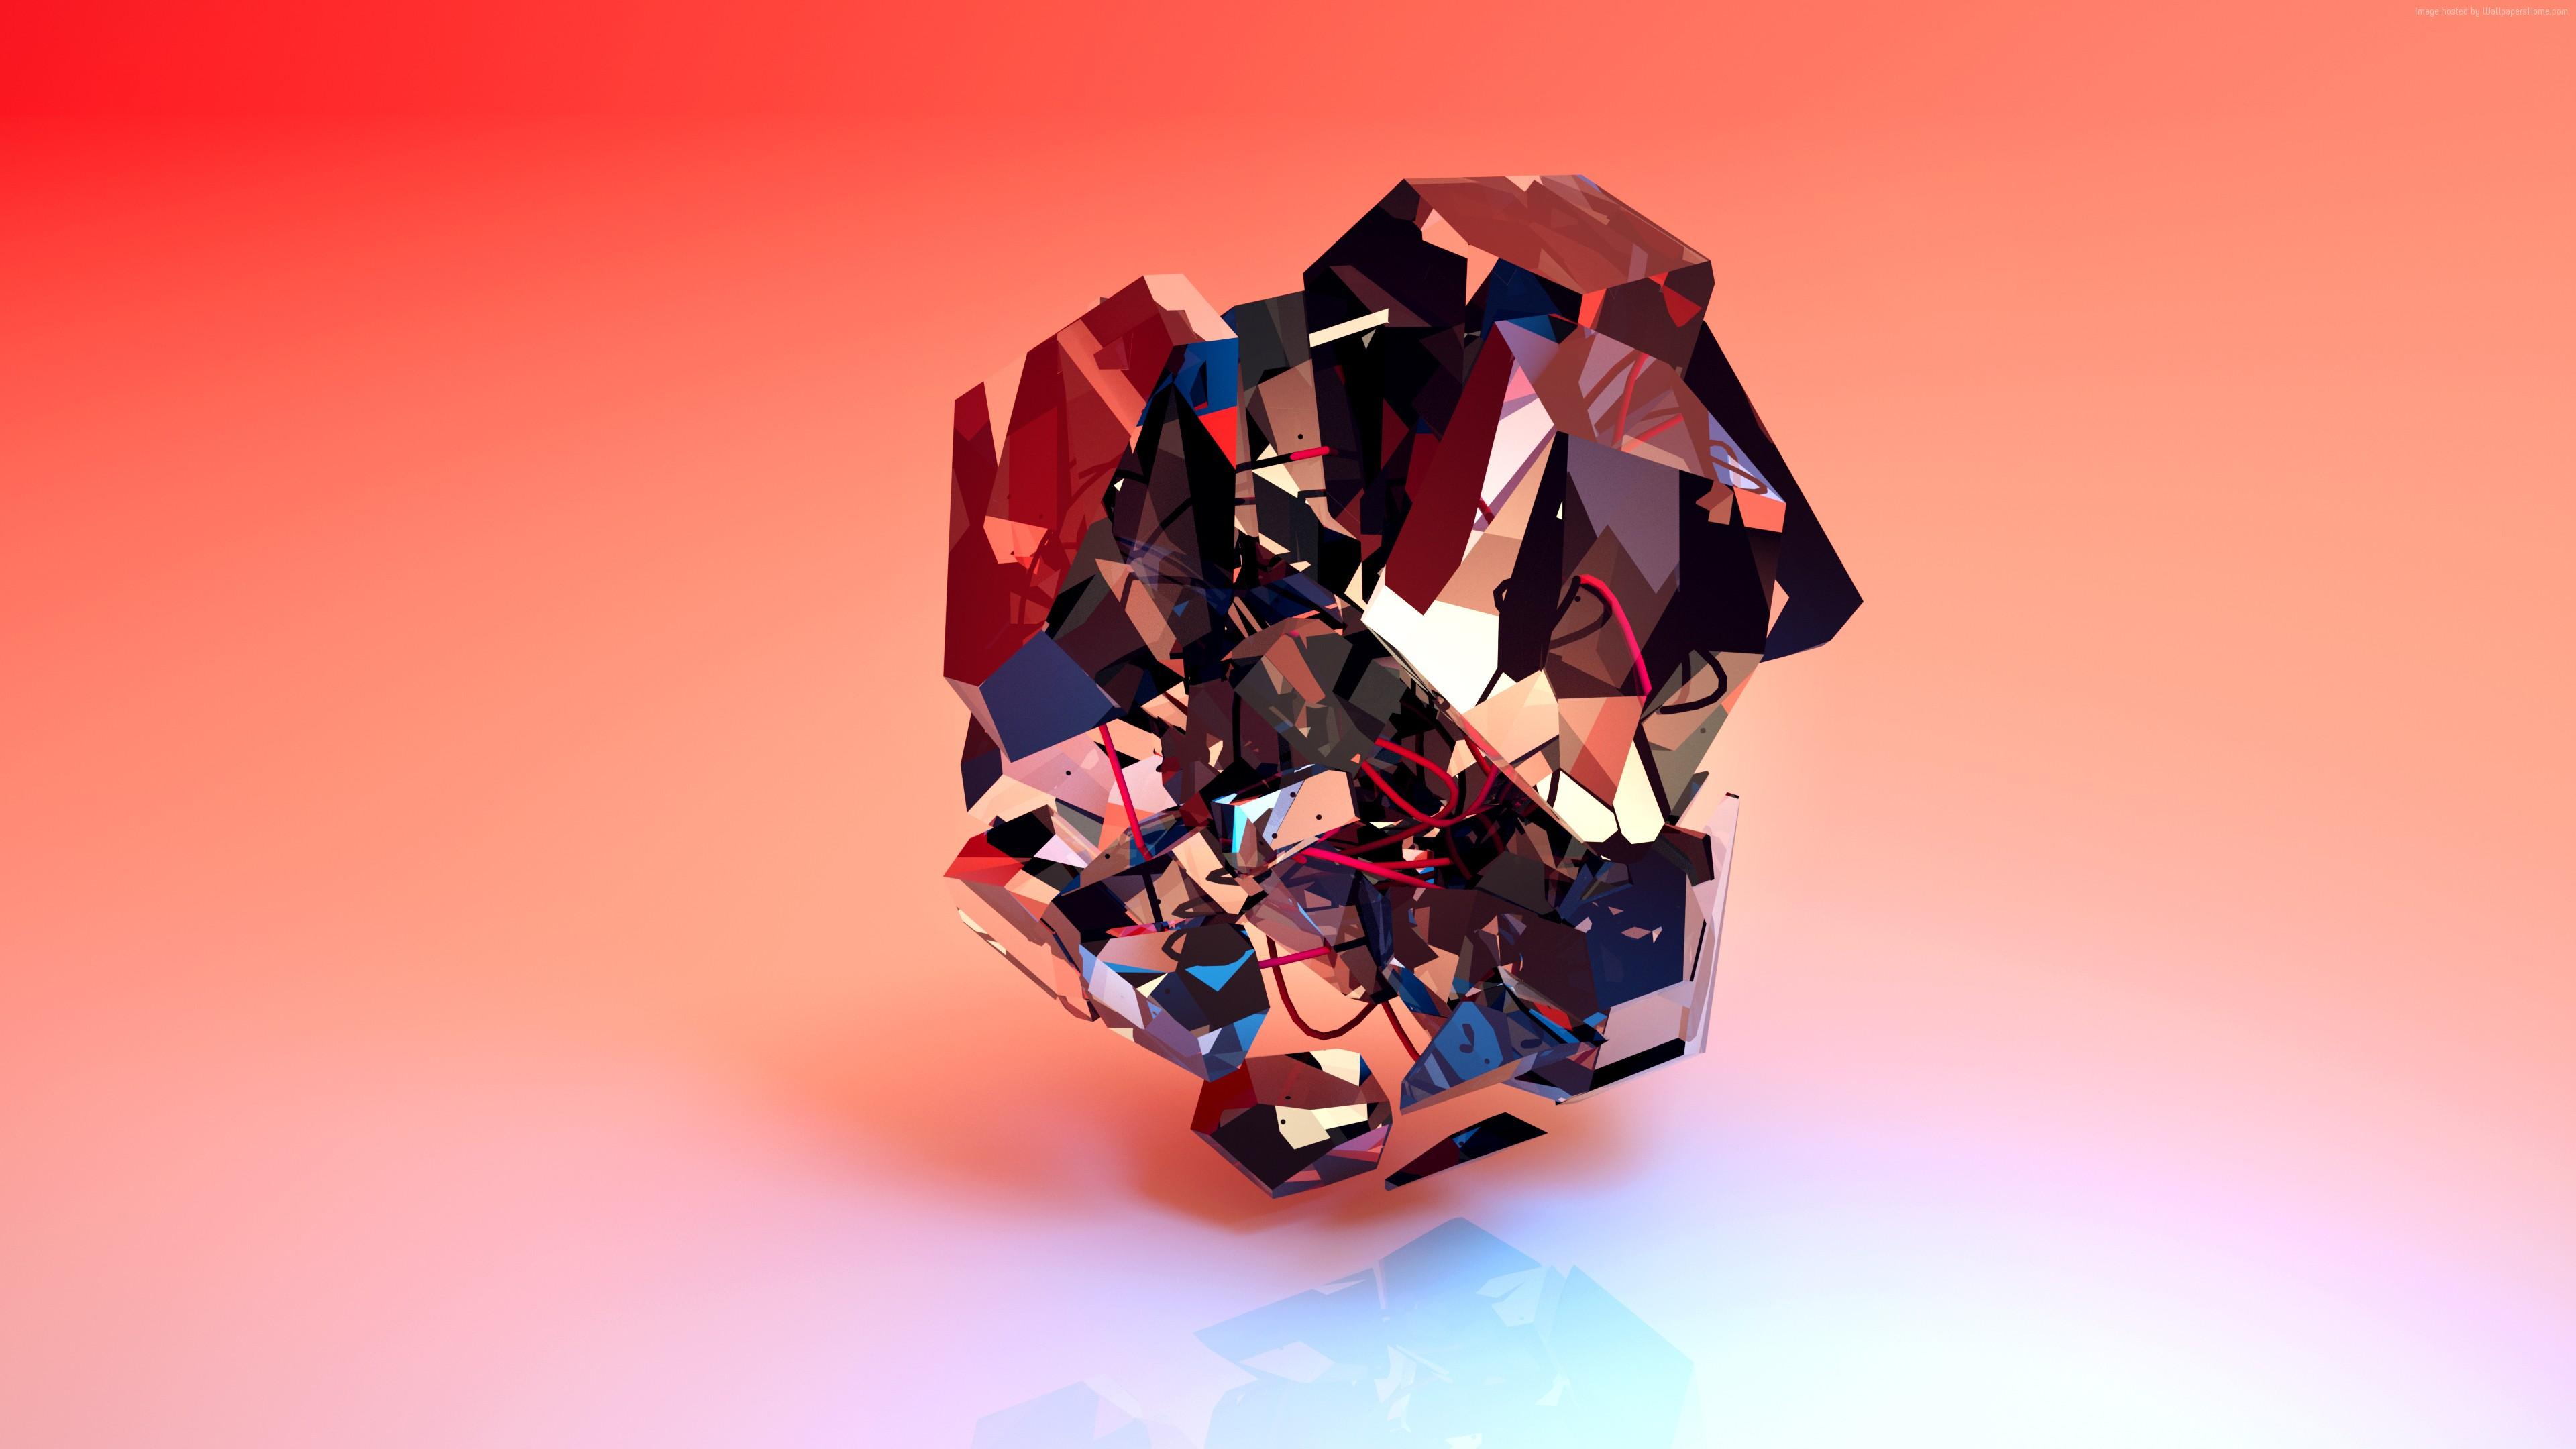 Deep Abstract Wallpaper 3D Shapes 4k 918279672